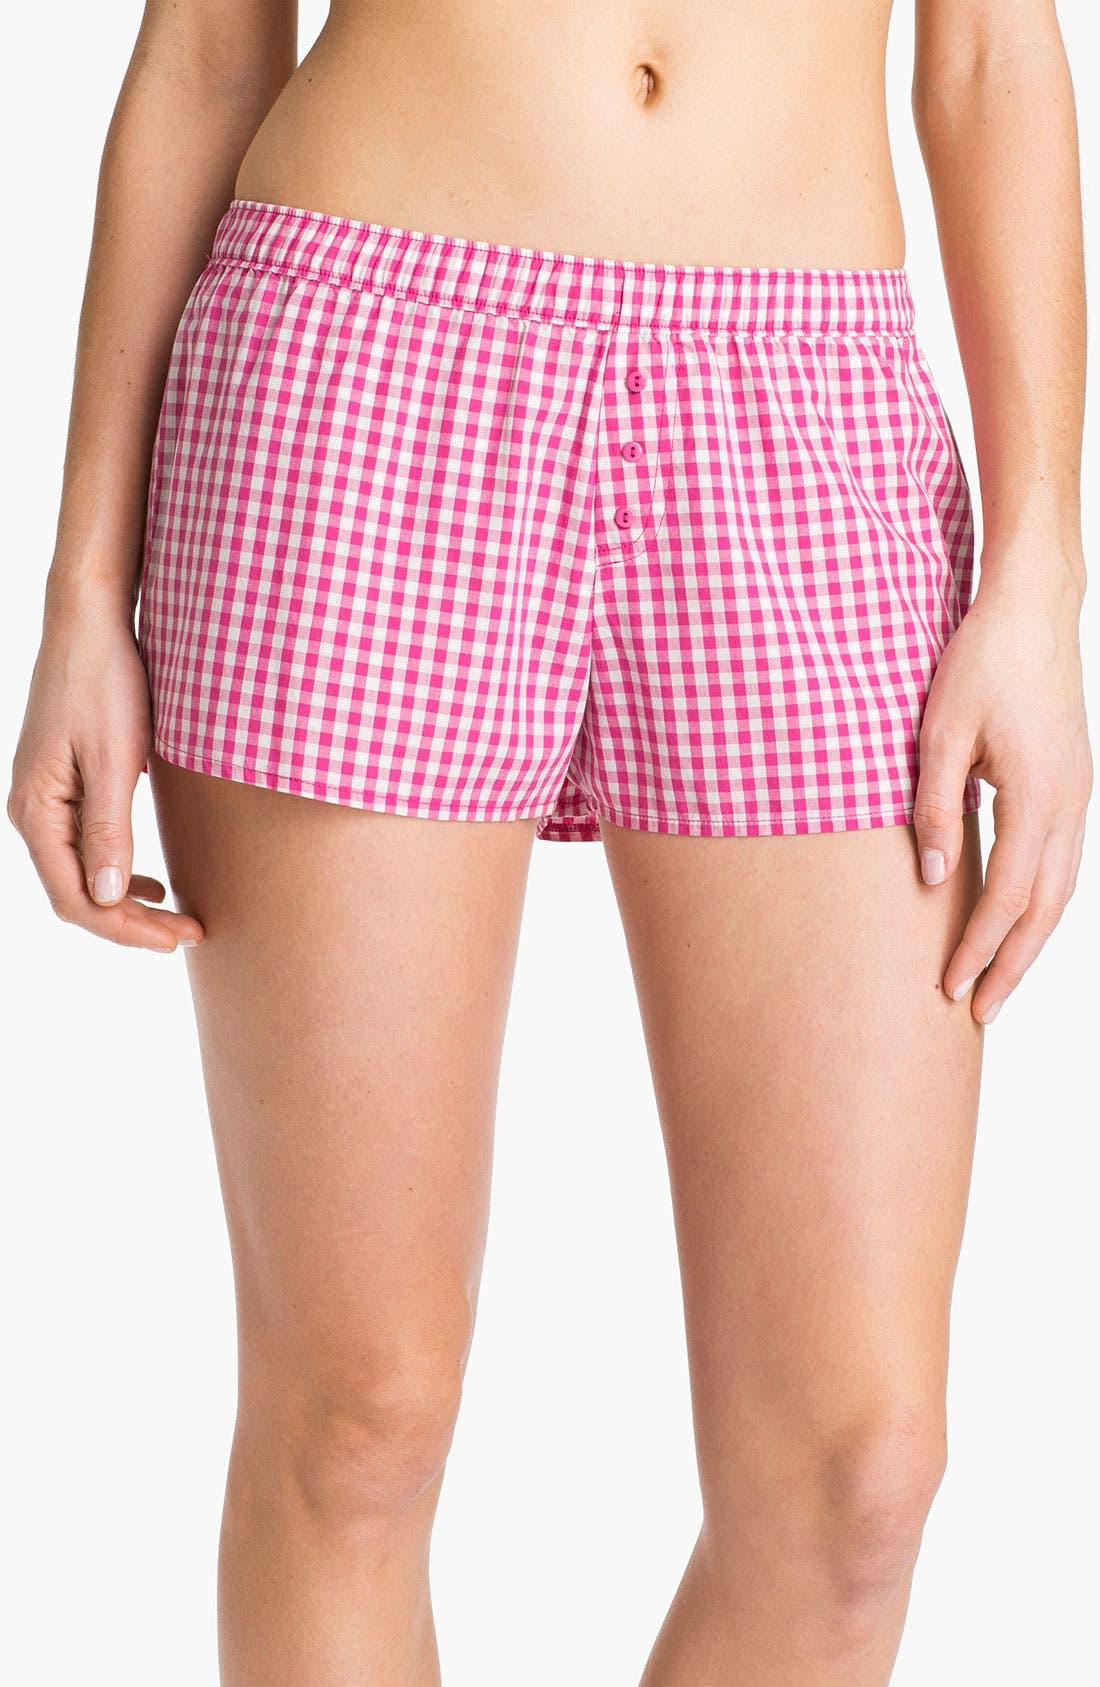 Main Image - Make + Model 'Short but Sweet' Lounge Shorts